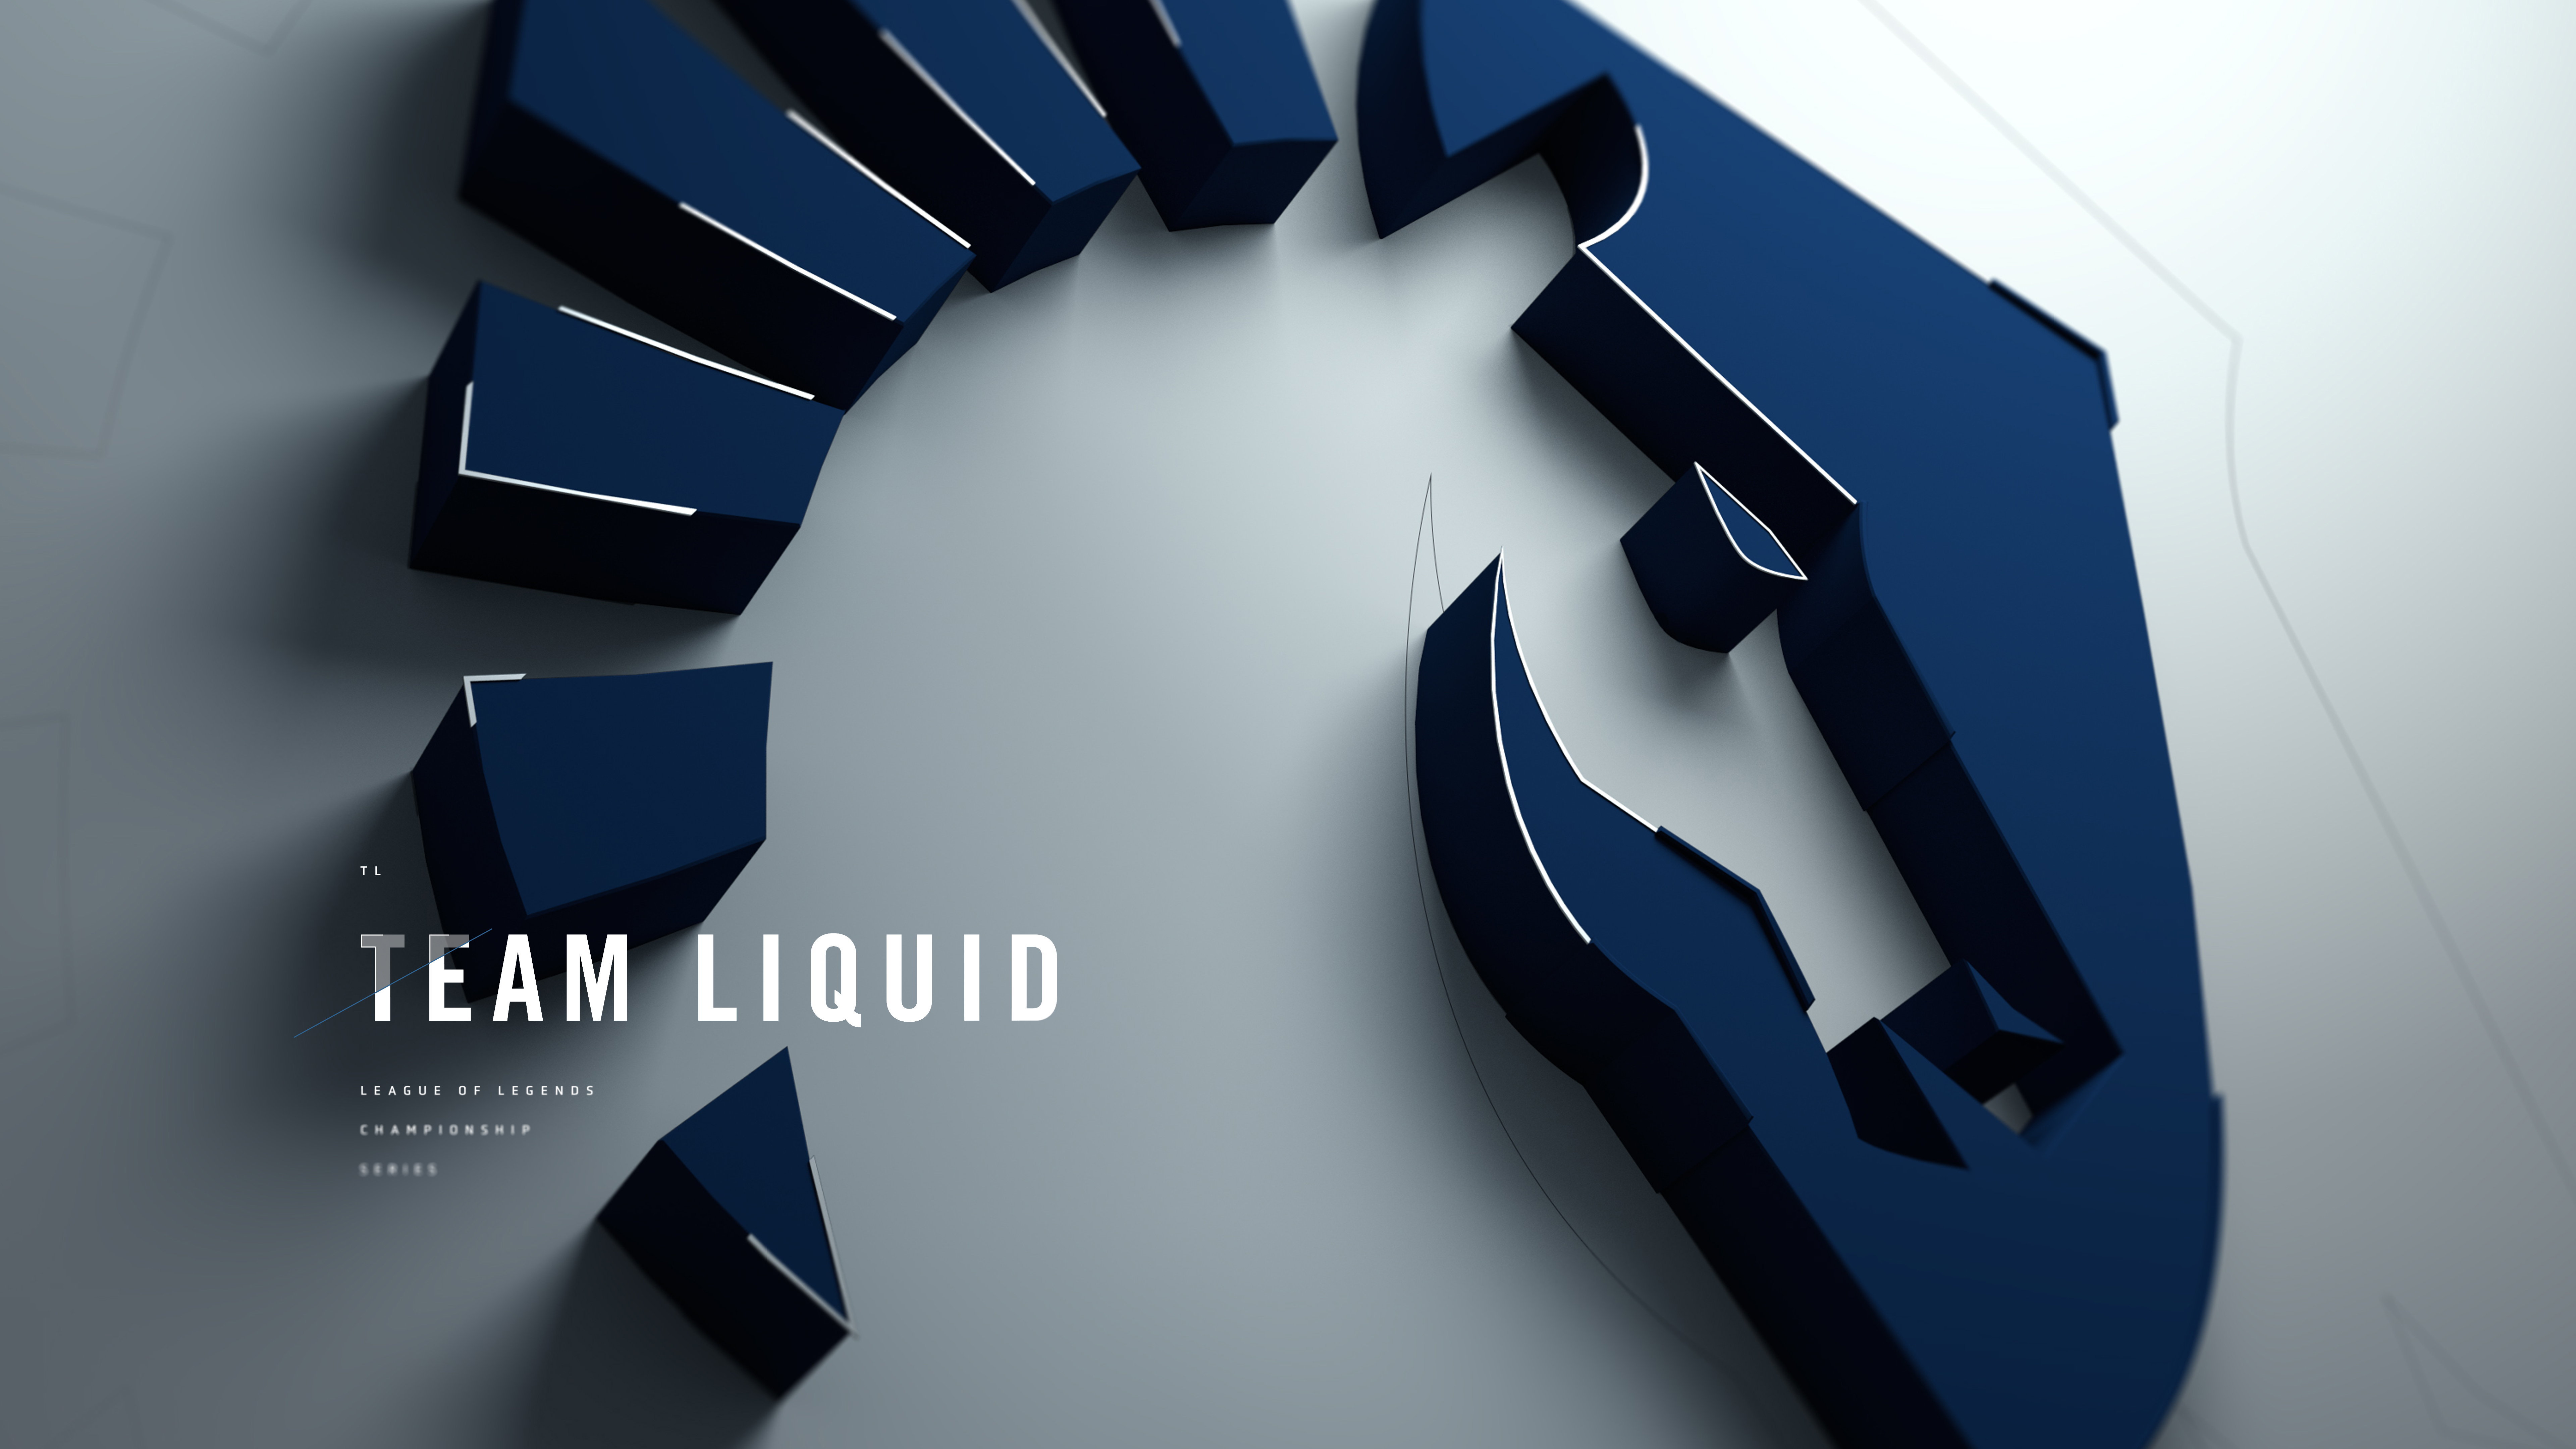 Team Liquid Desktop Background - HD Wallpaper